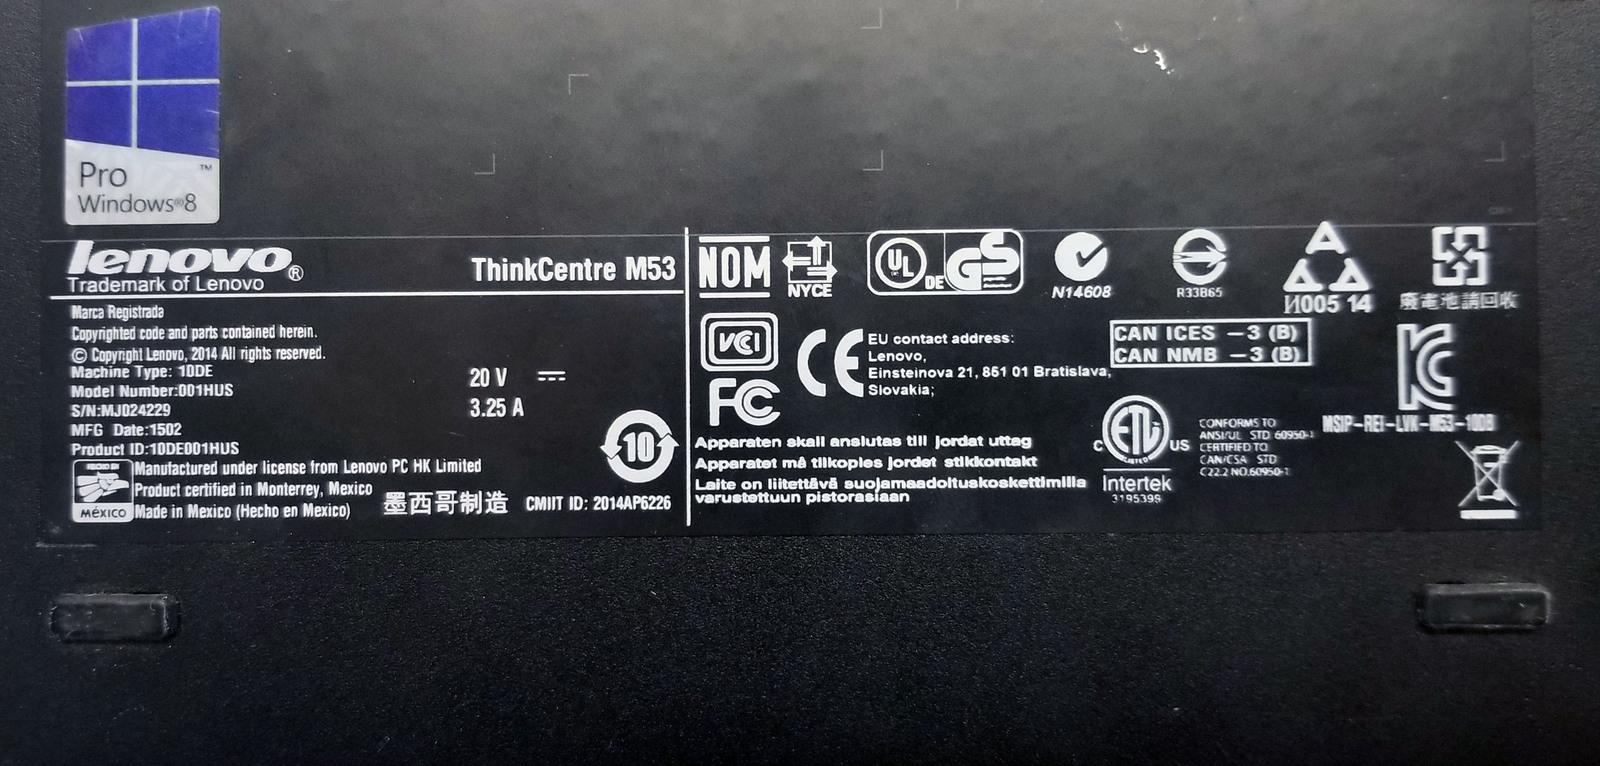 Lenovo ThinkCentre M53 Powerful Tiny Desktop (001HUS) Bin:SF